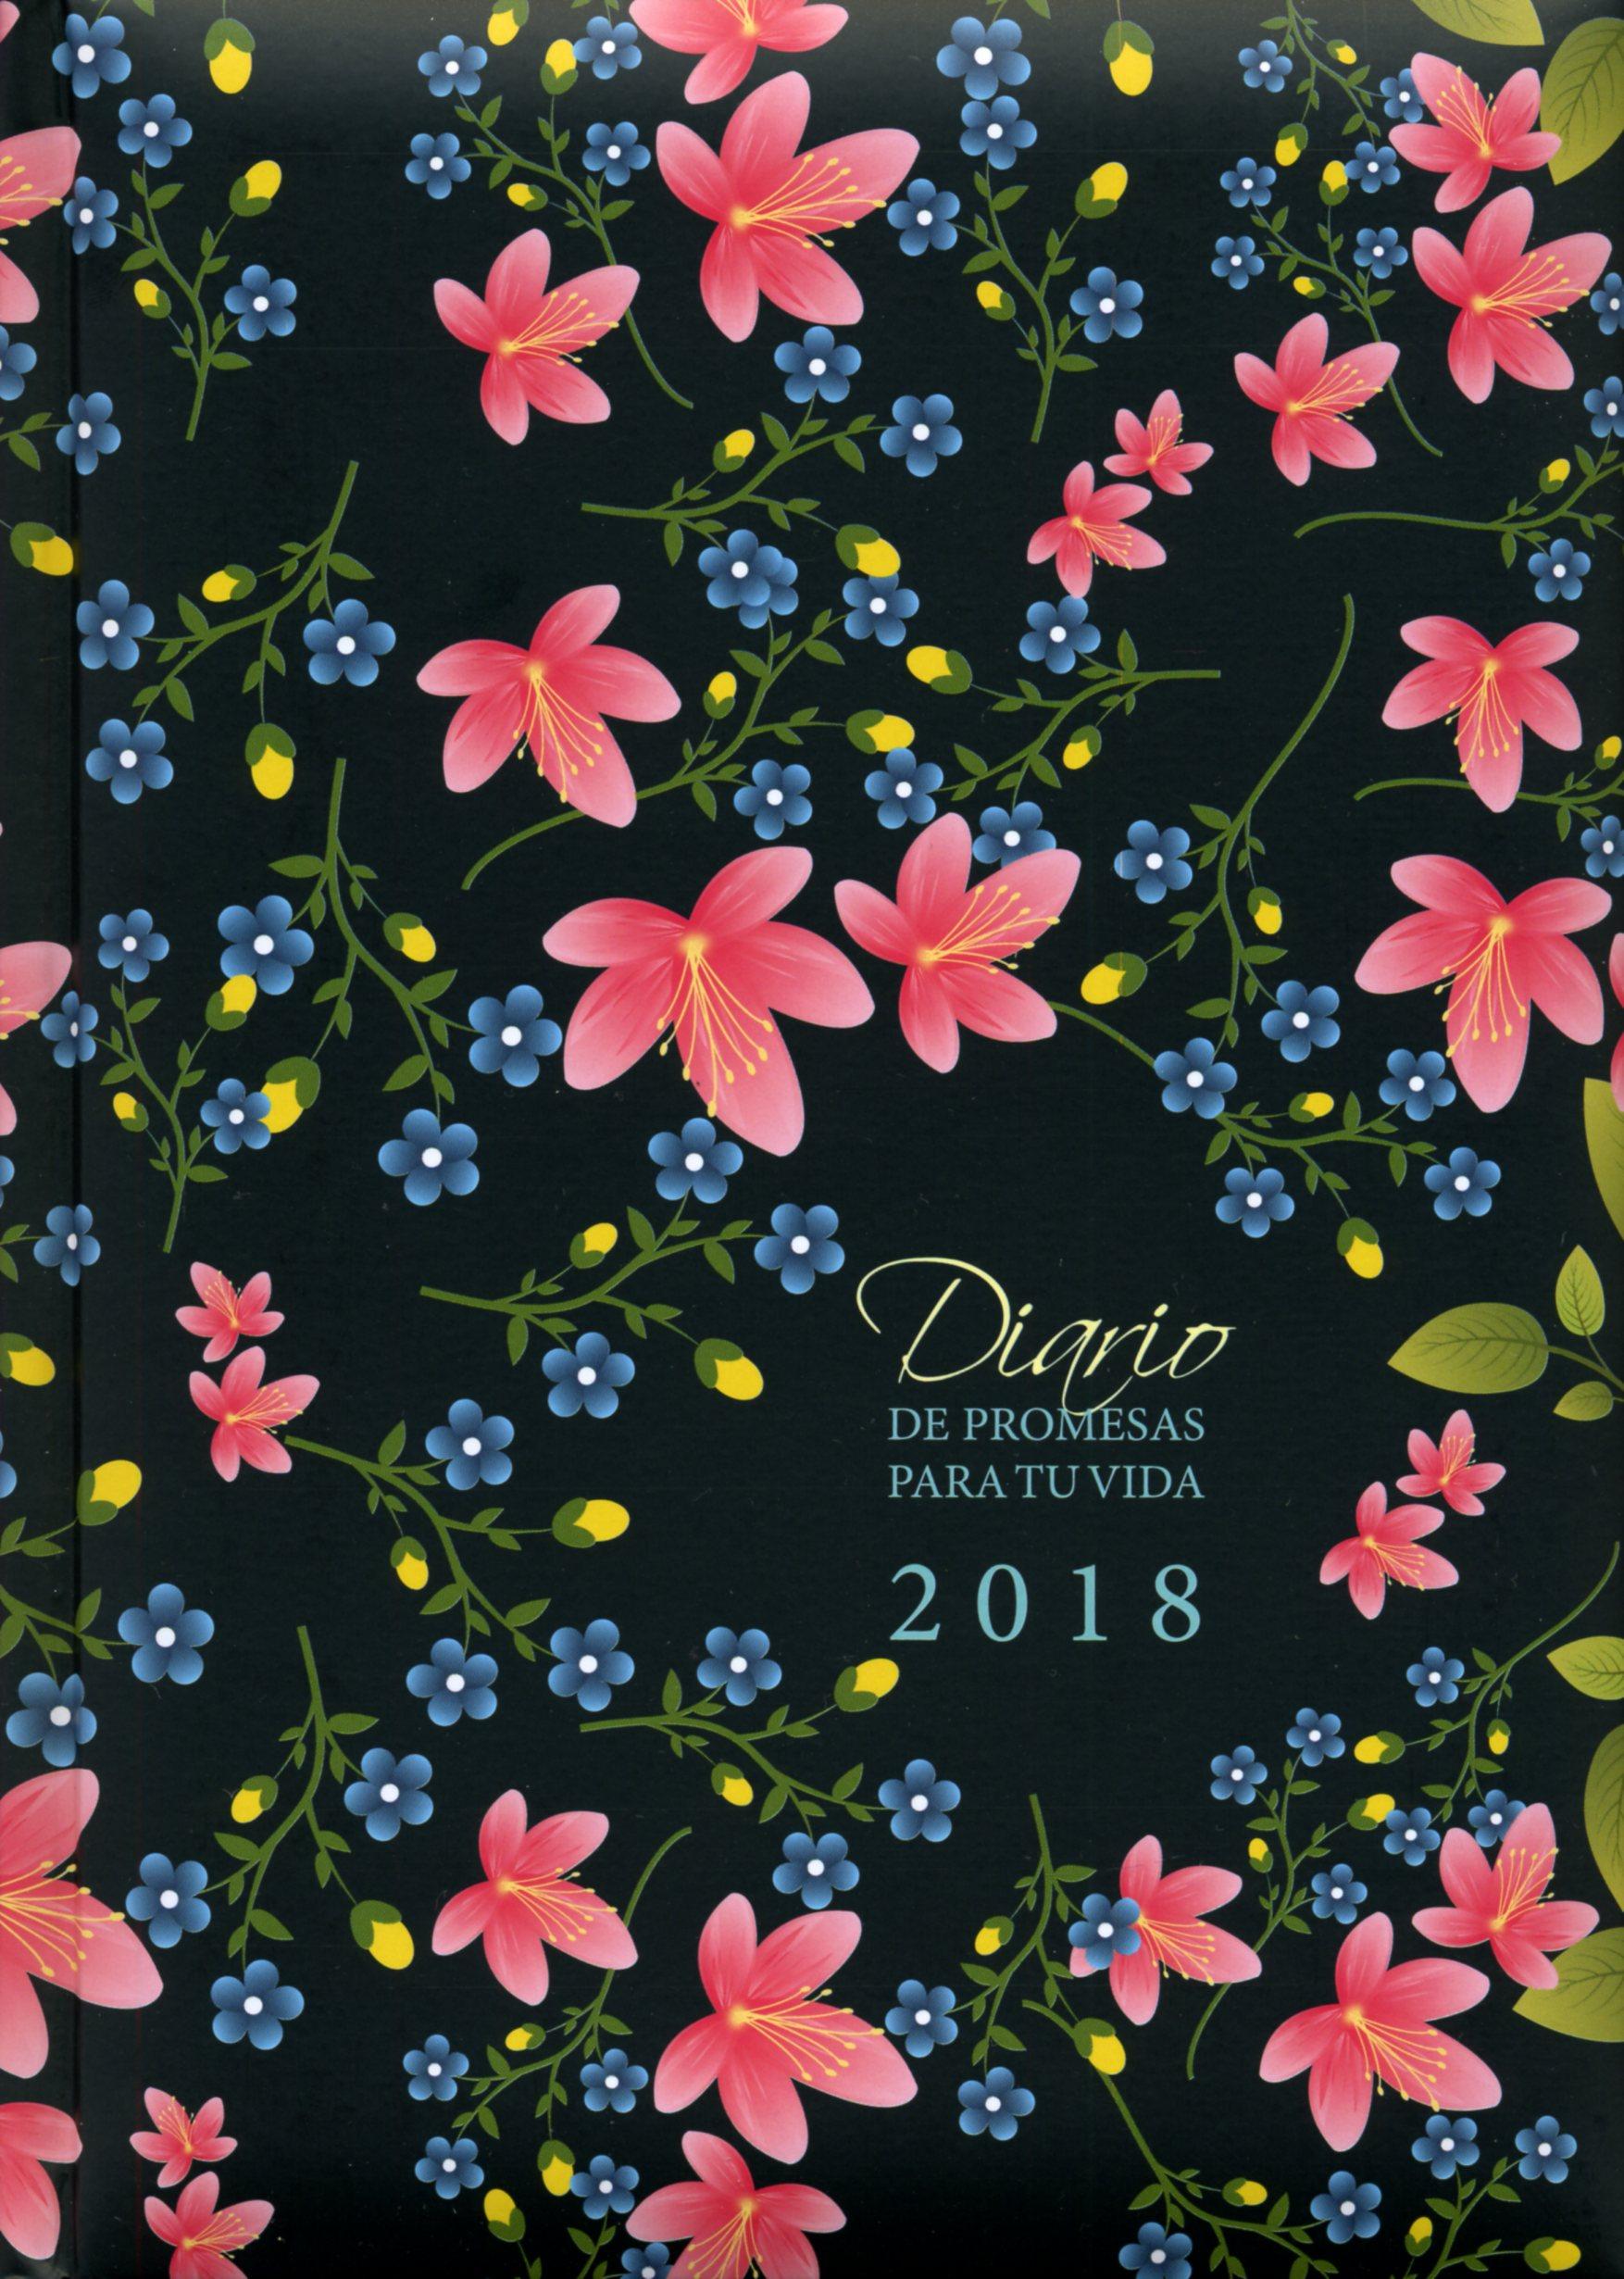 Agenda Diario De Promesas Para Tu Vida Flores: Edición